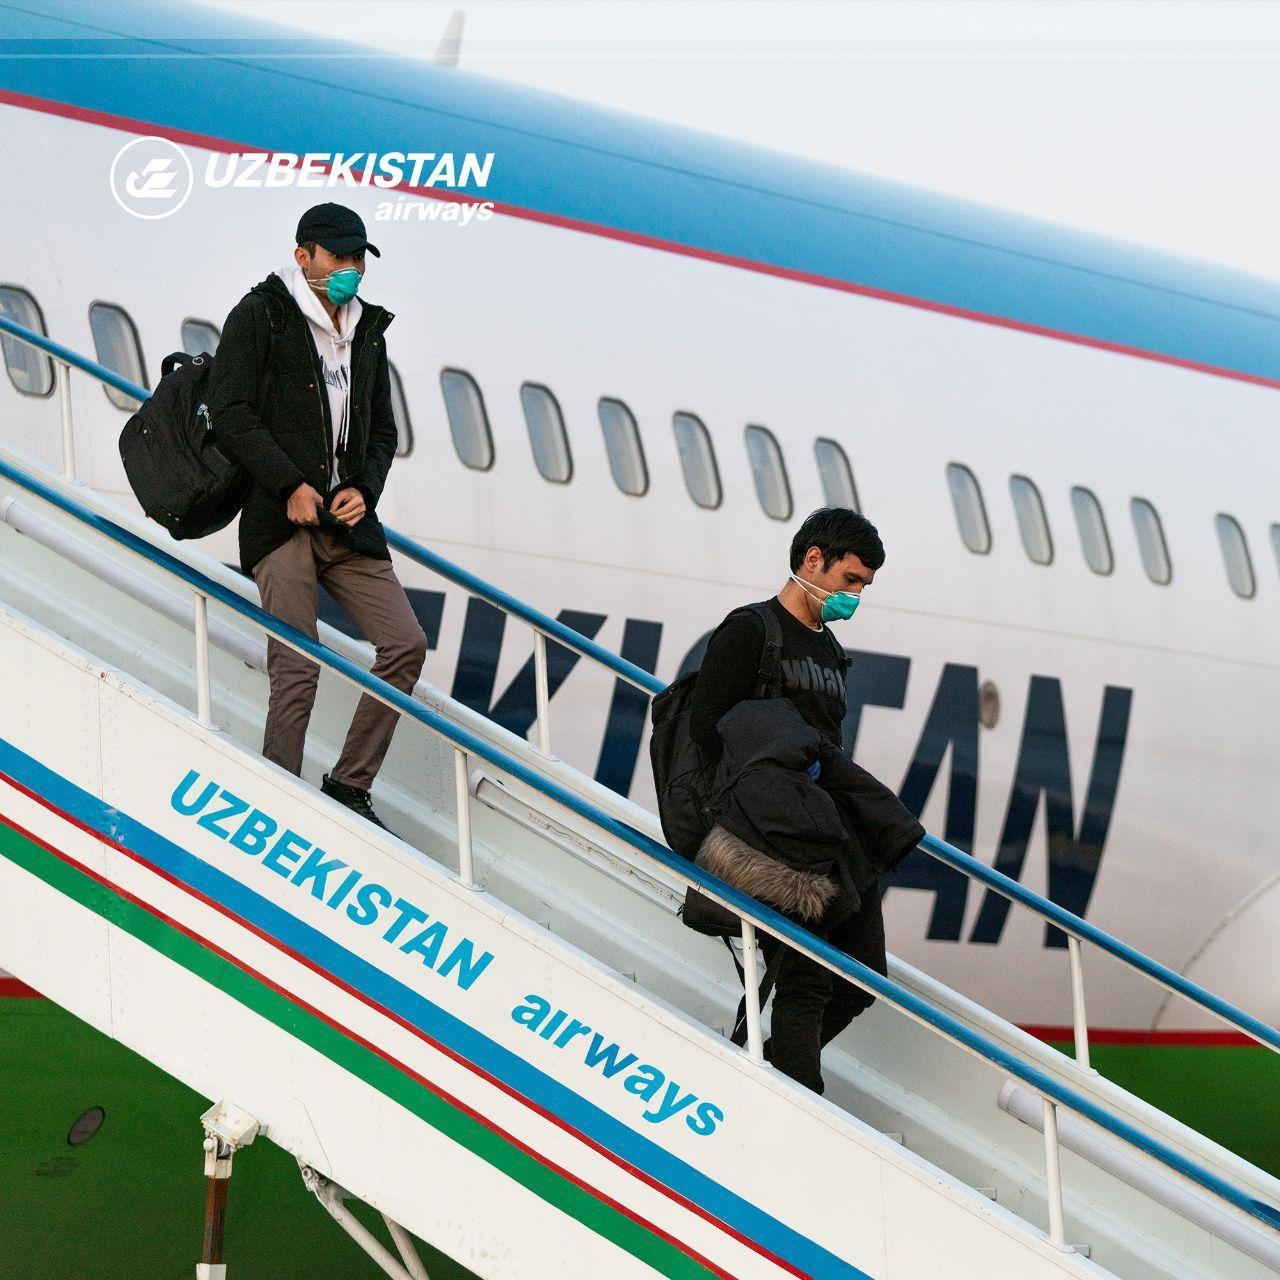 Ўзбекистон Пекиндан яна 251 нафар фуқарони эвакуация қилди